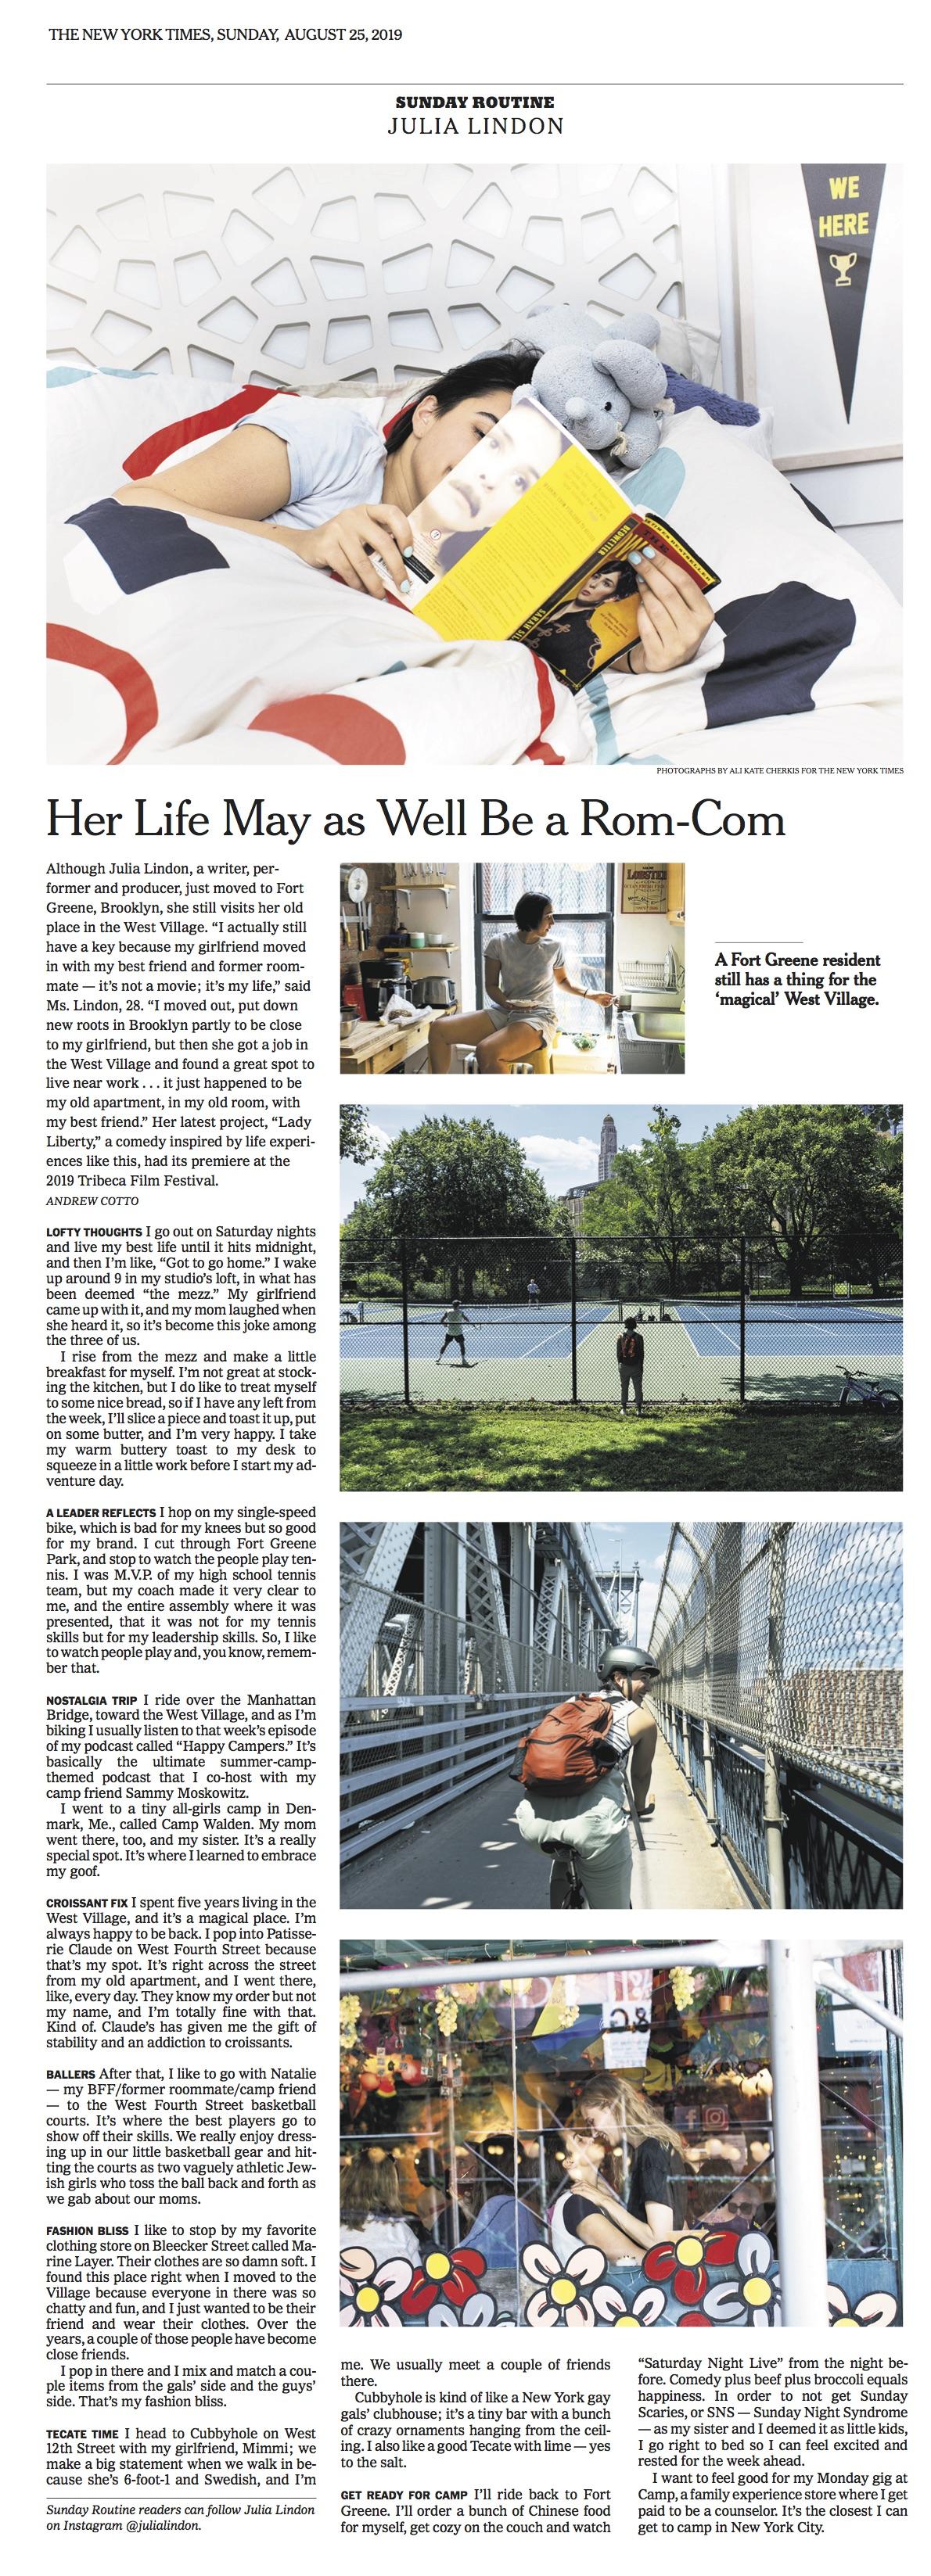 NYT_Lindon.jpg